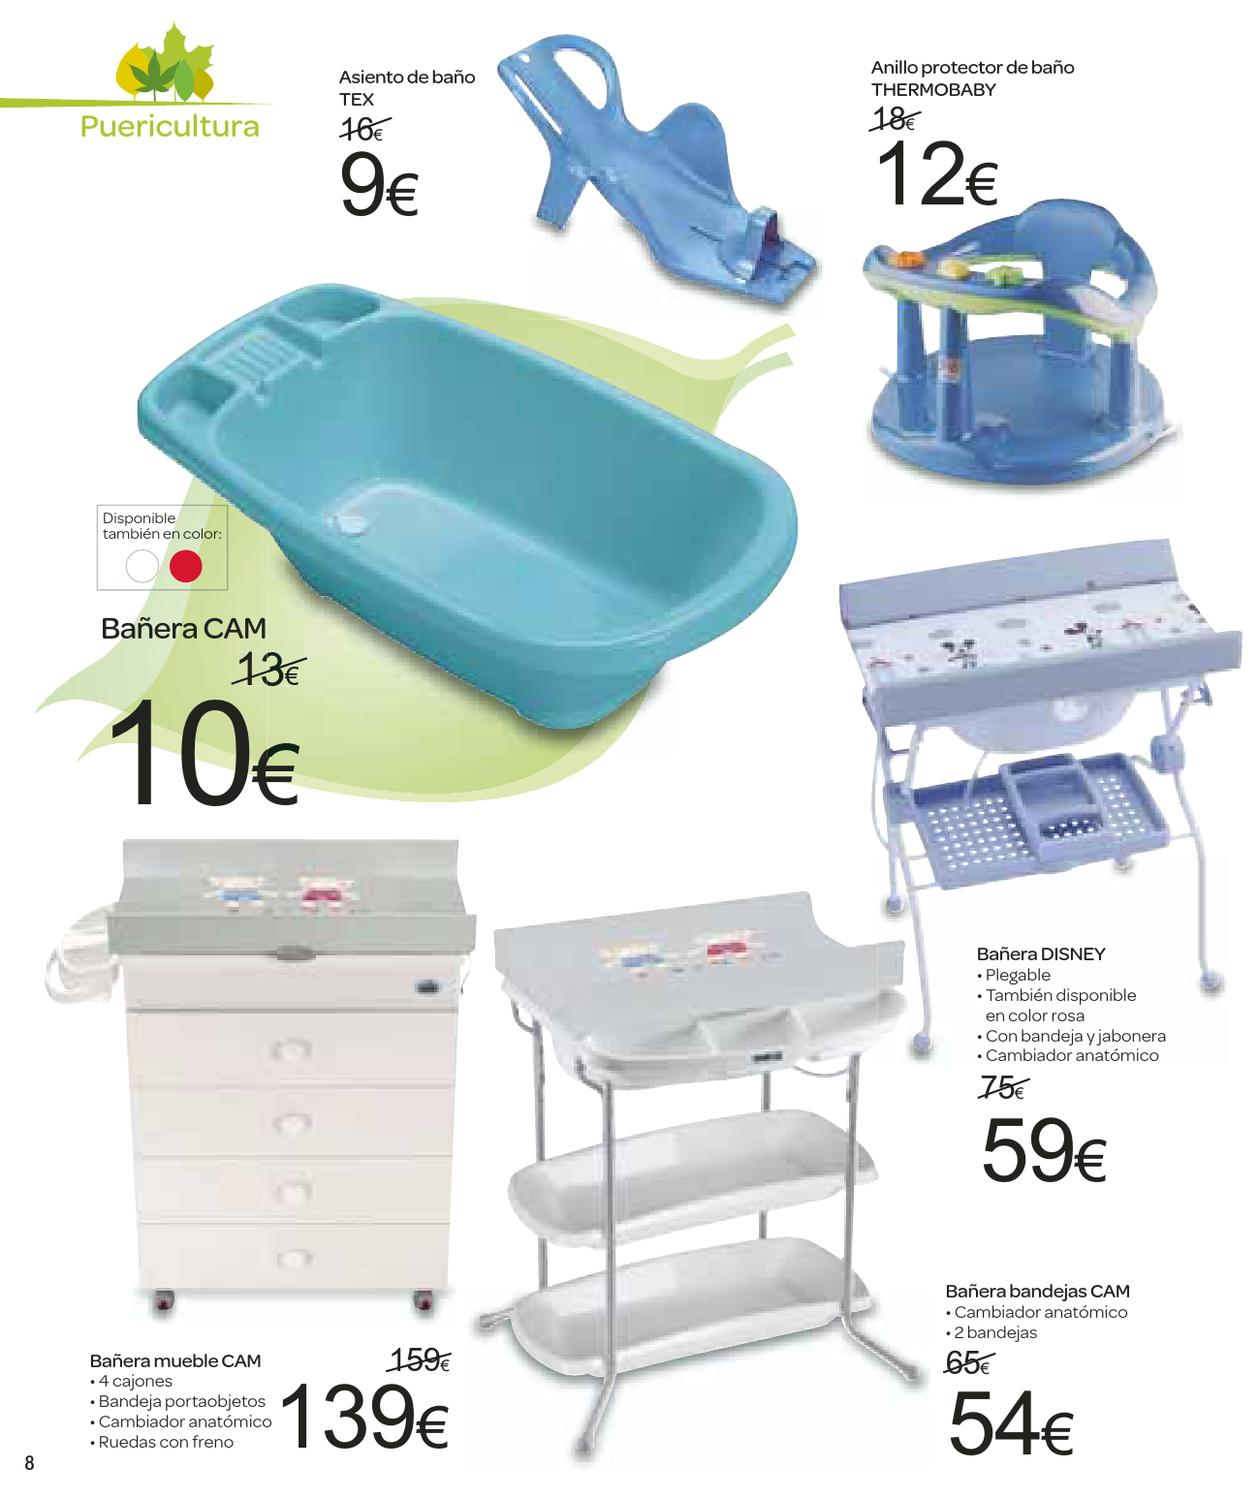 Catalogo carrefour de ropa bebe oto o invierno 2012 2013 - Carrefour bano ...